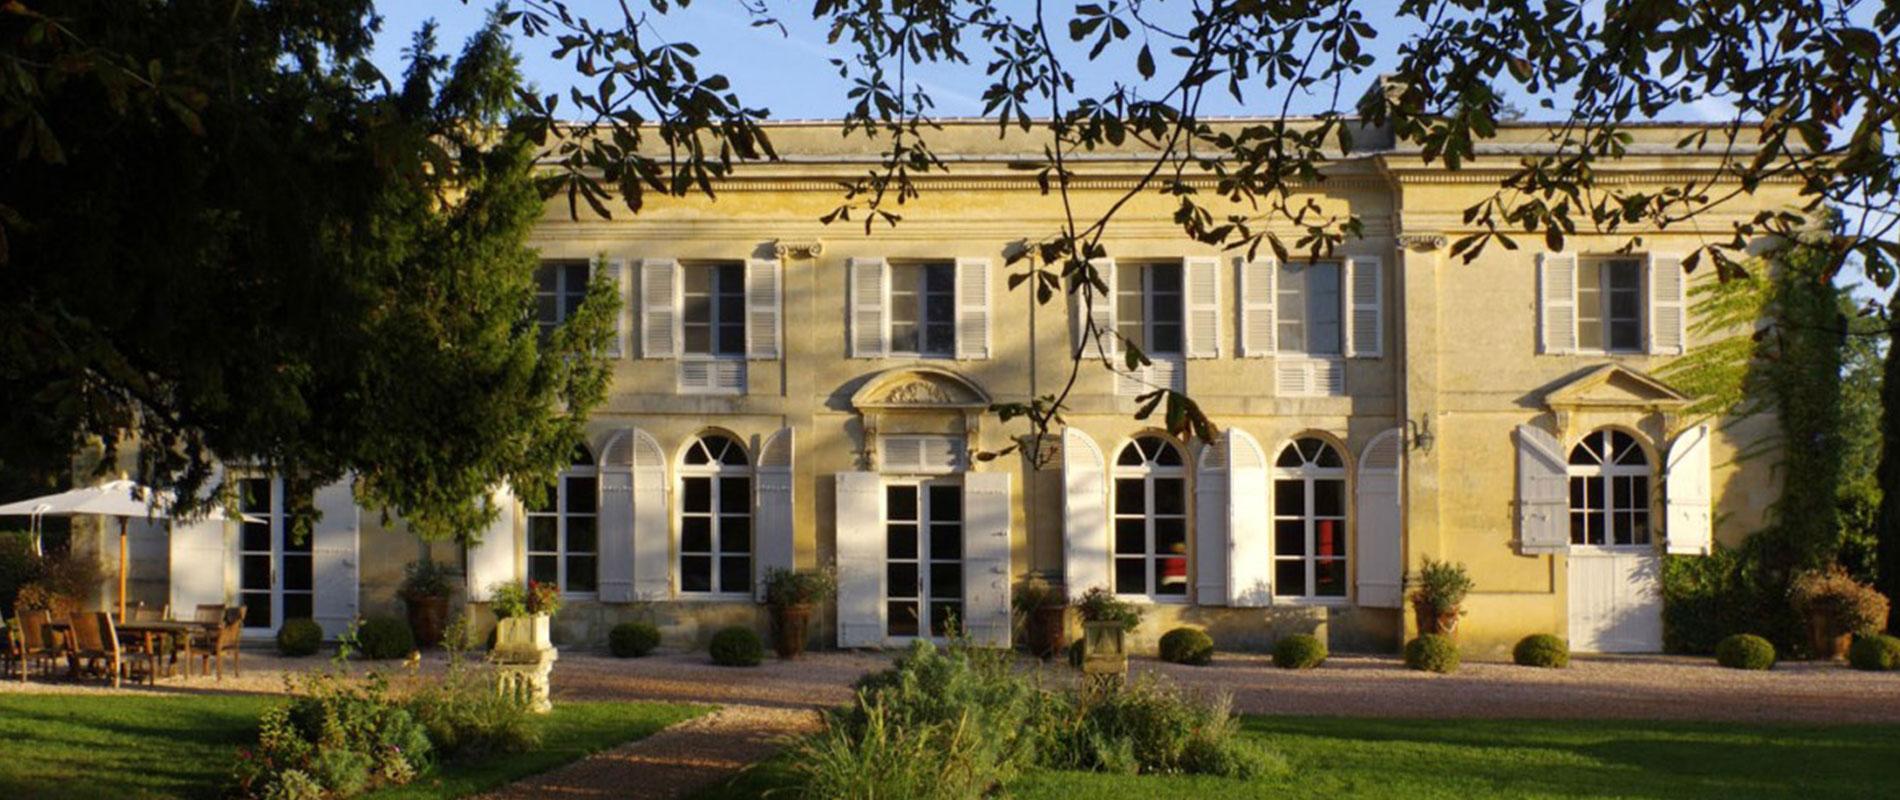 Chateau-les-conseillans-home